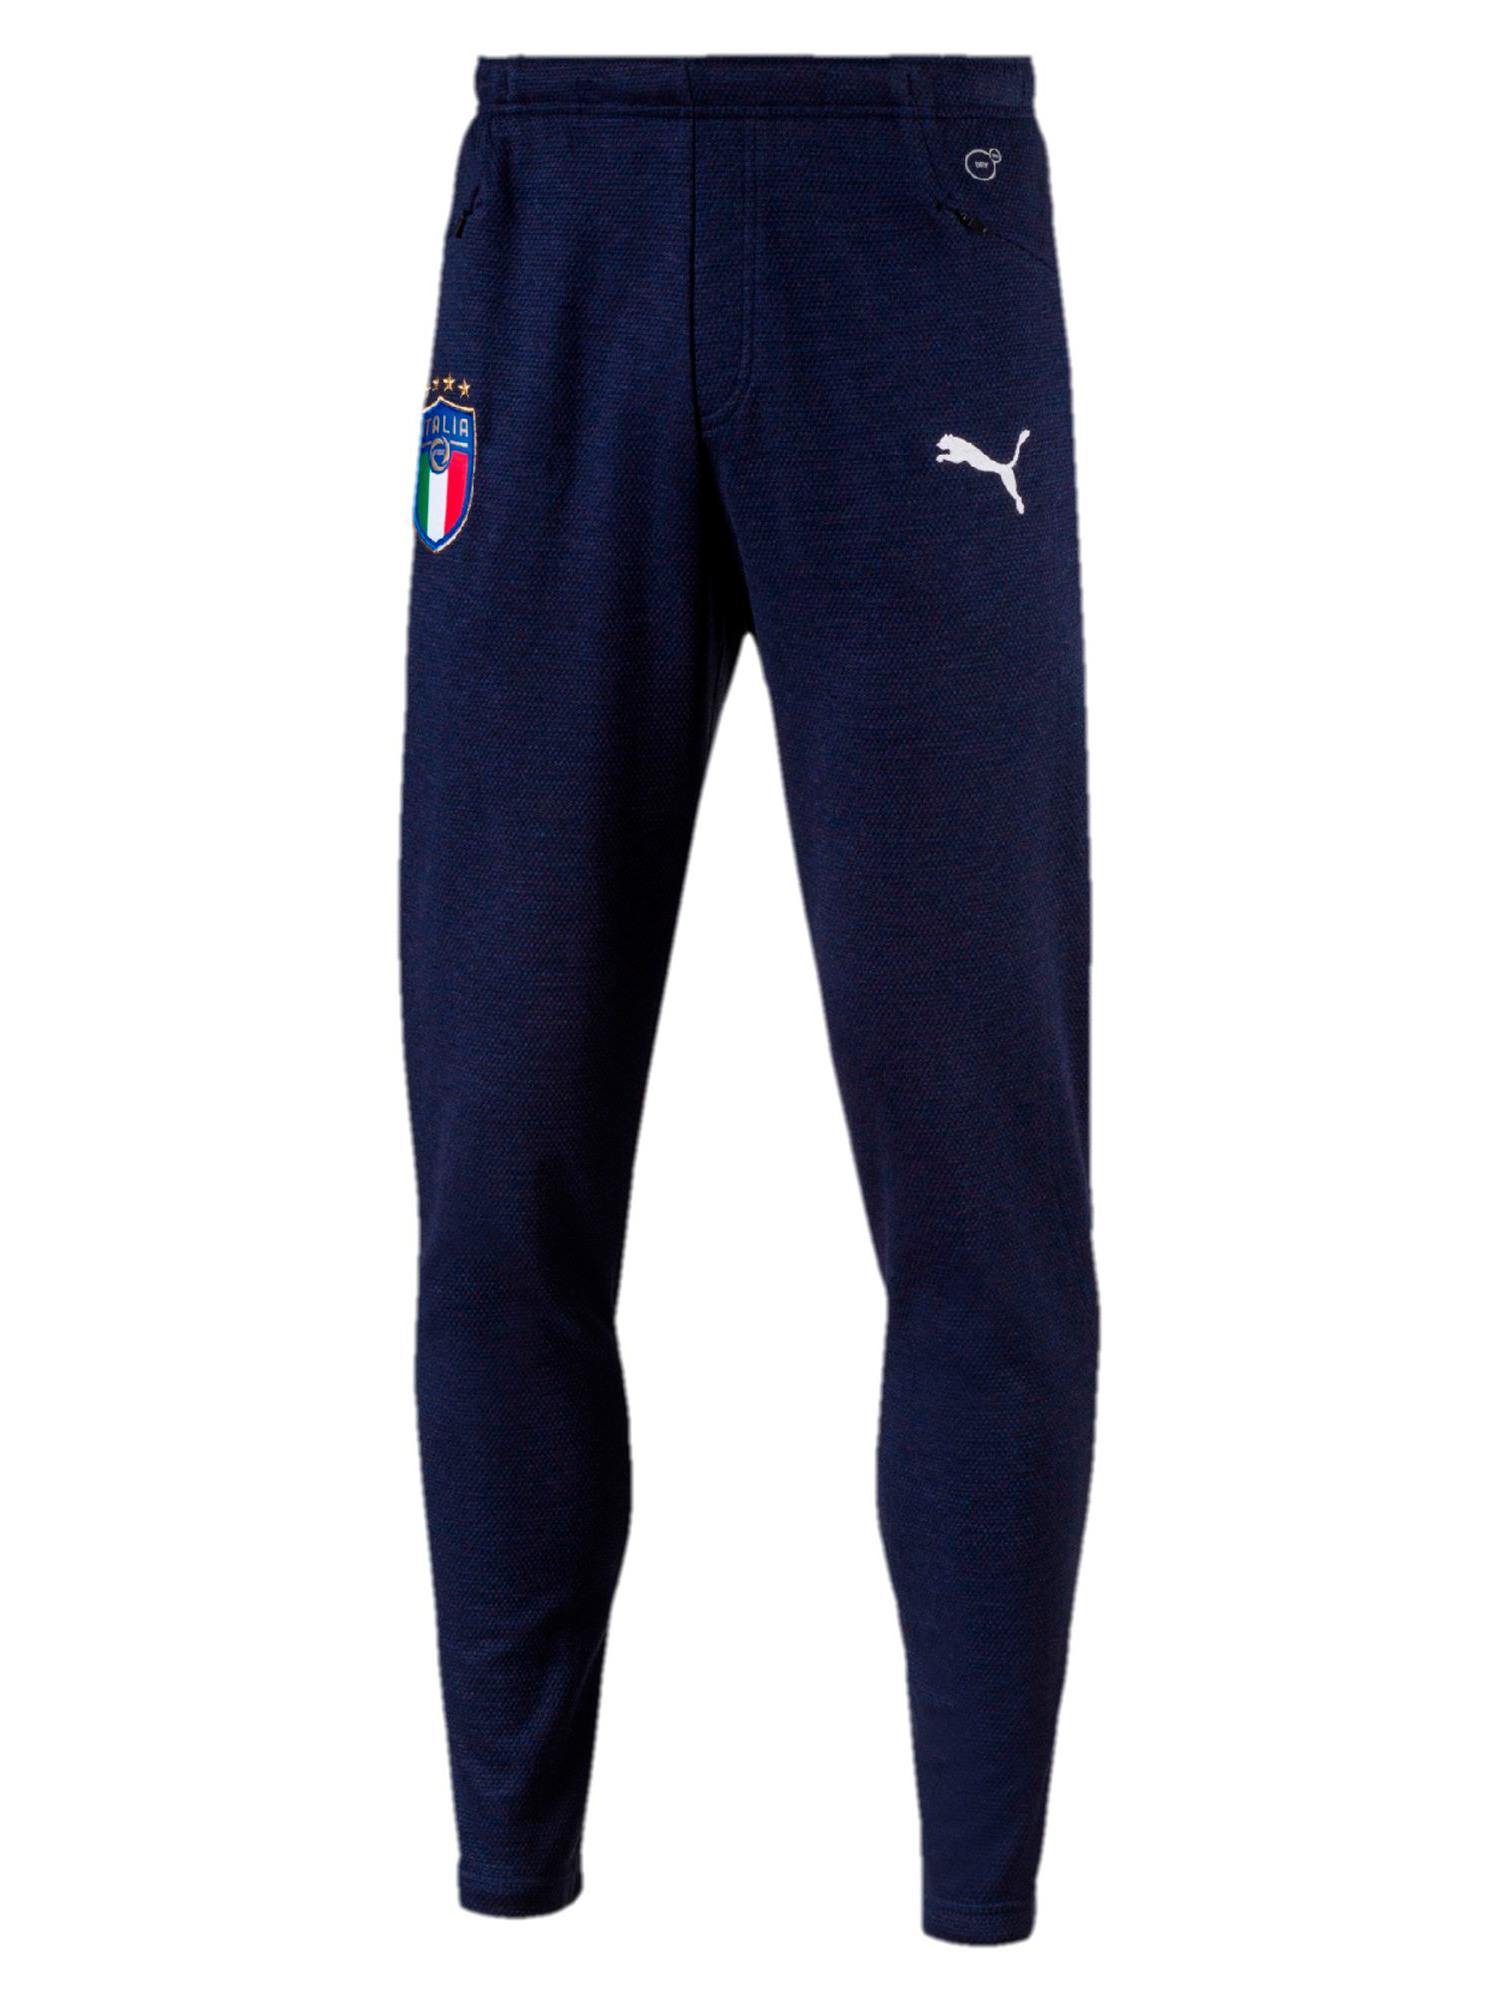 Italia-FIGC-Puma-Pantalones-traje-Algodon-Casual-Performance-Sweat-2018-Blau